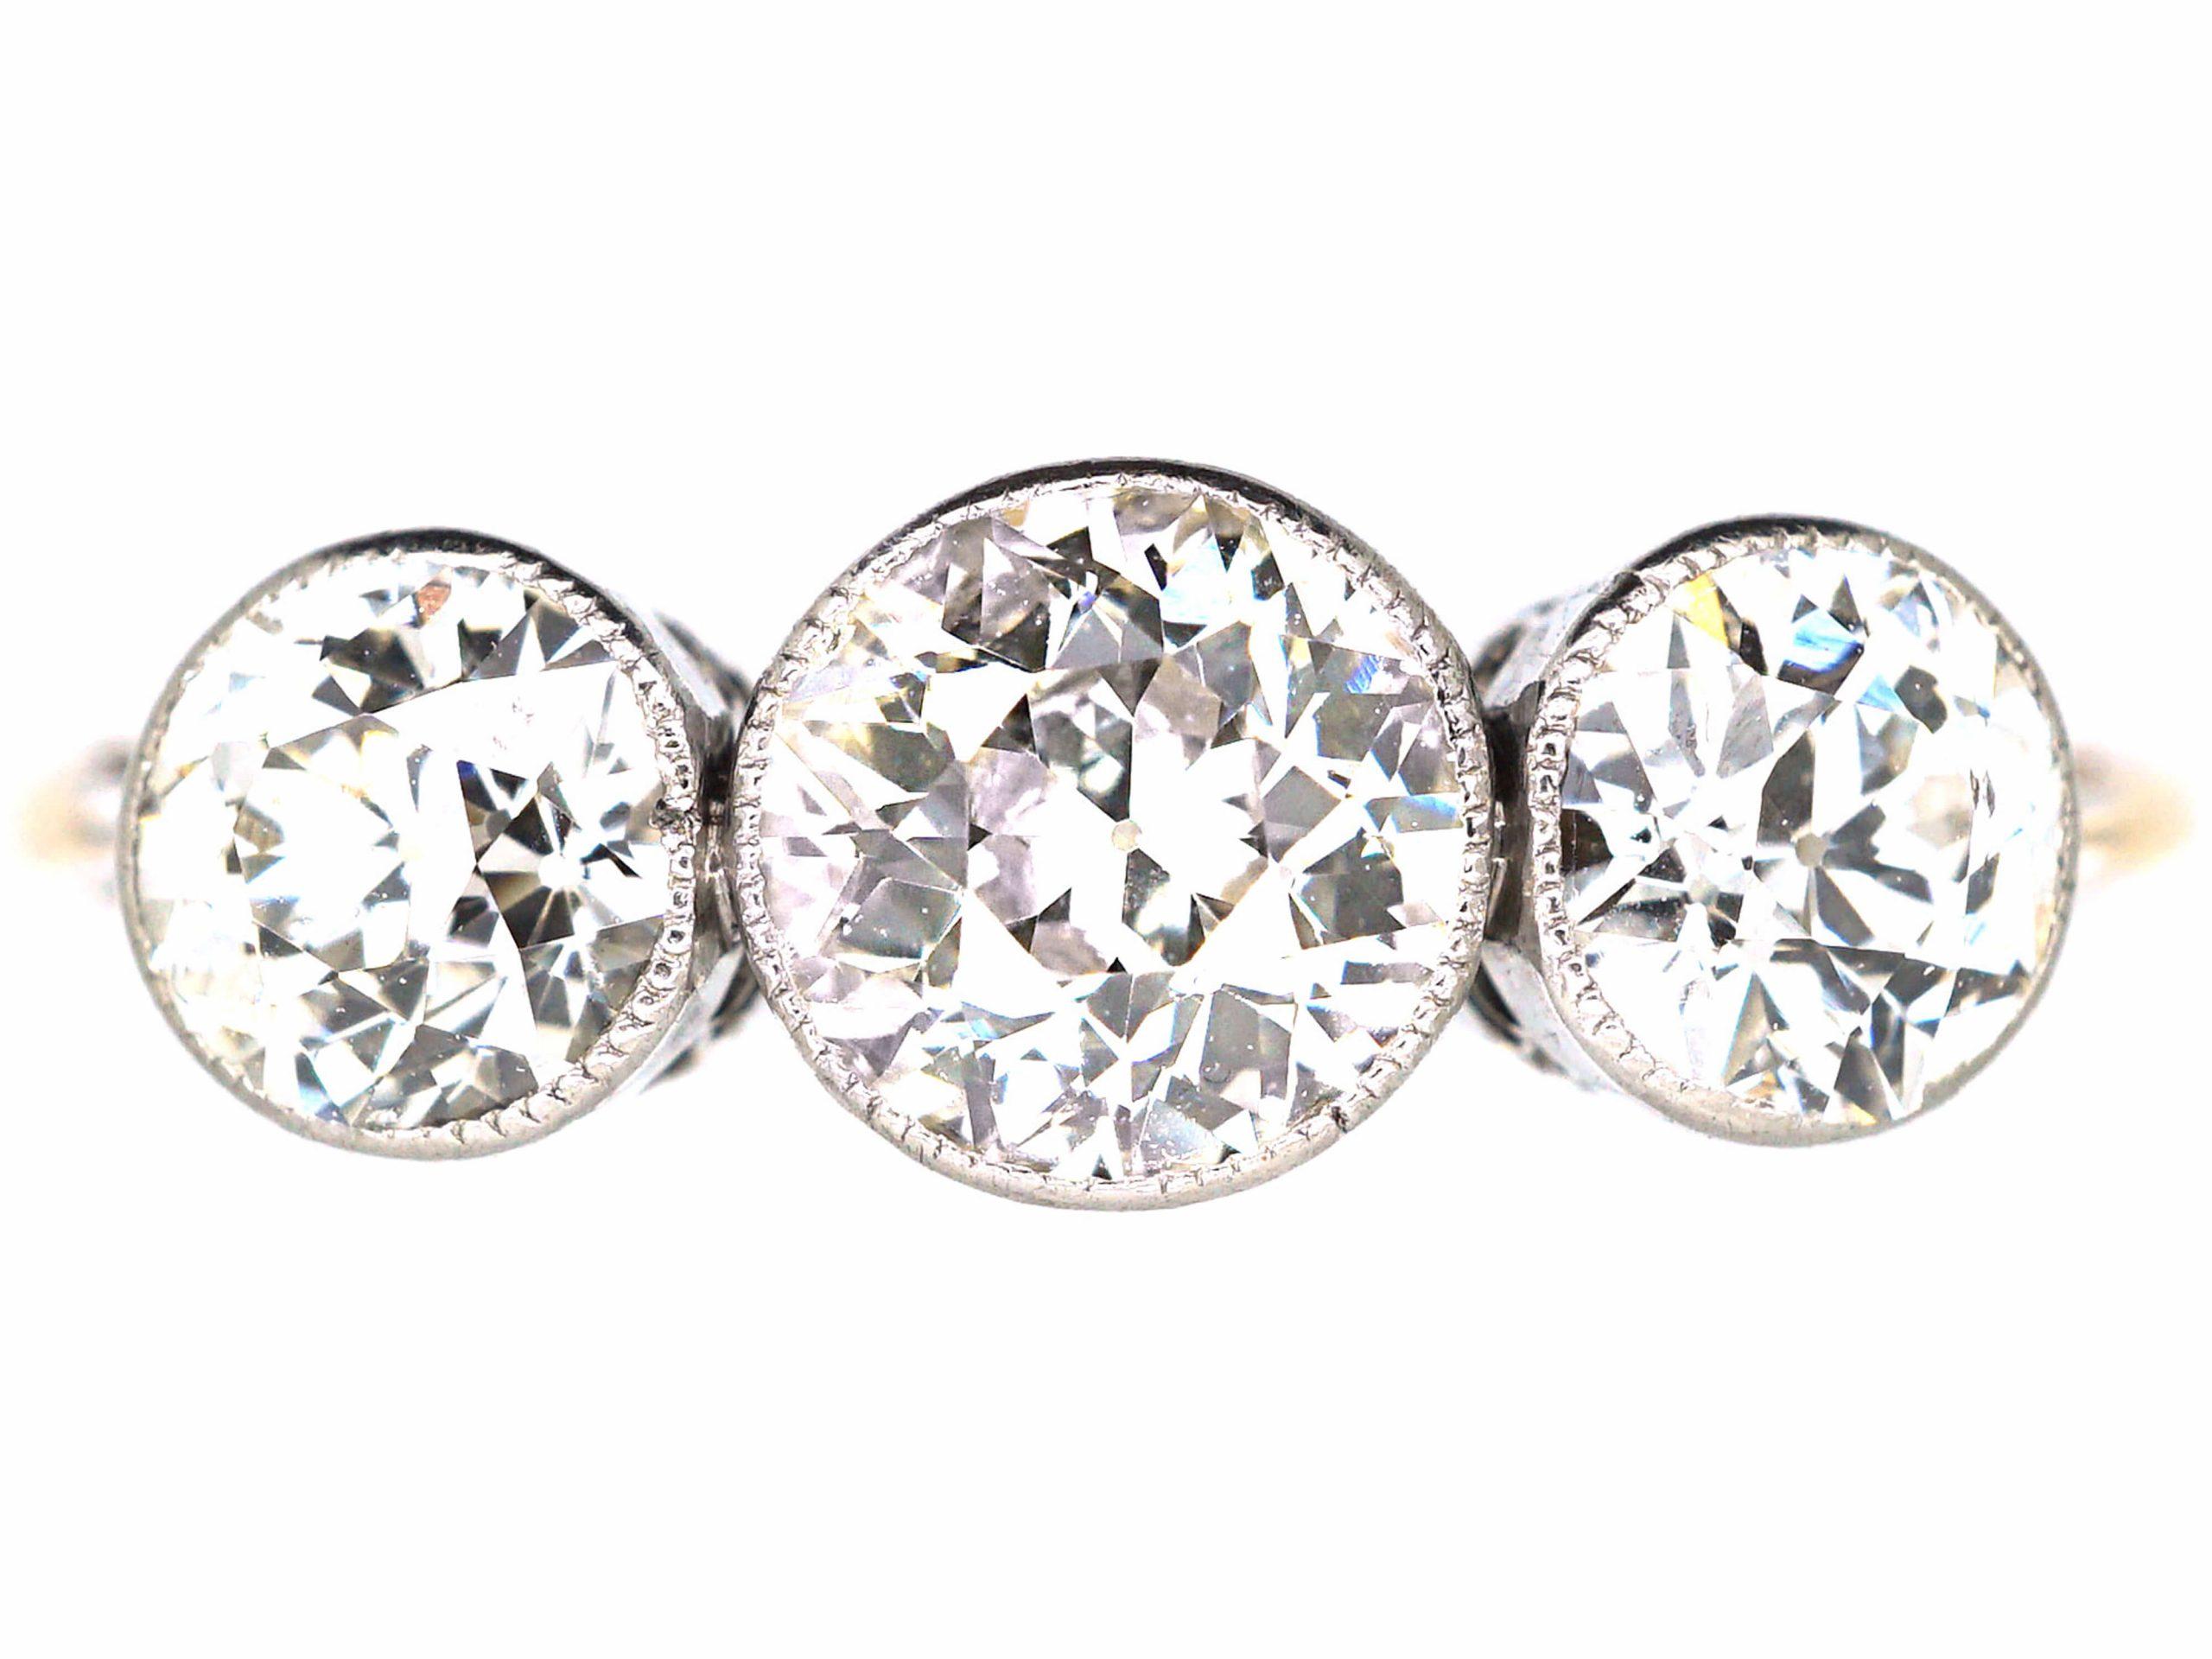 Edwardian 18ct Gold & Platinum, Three Stone Diamond Ring